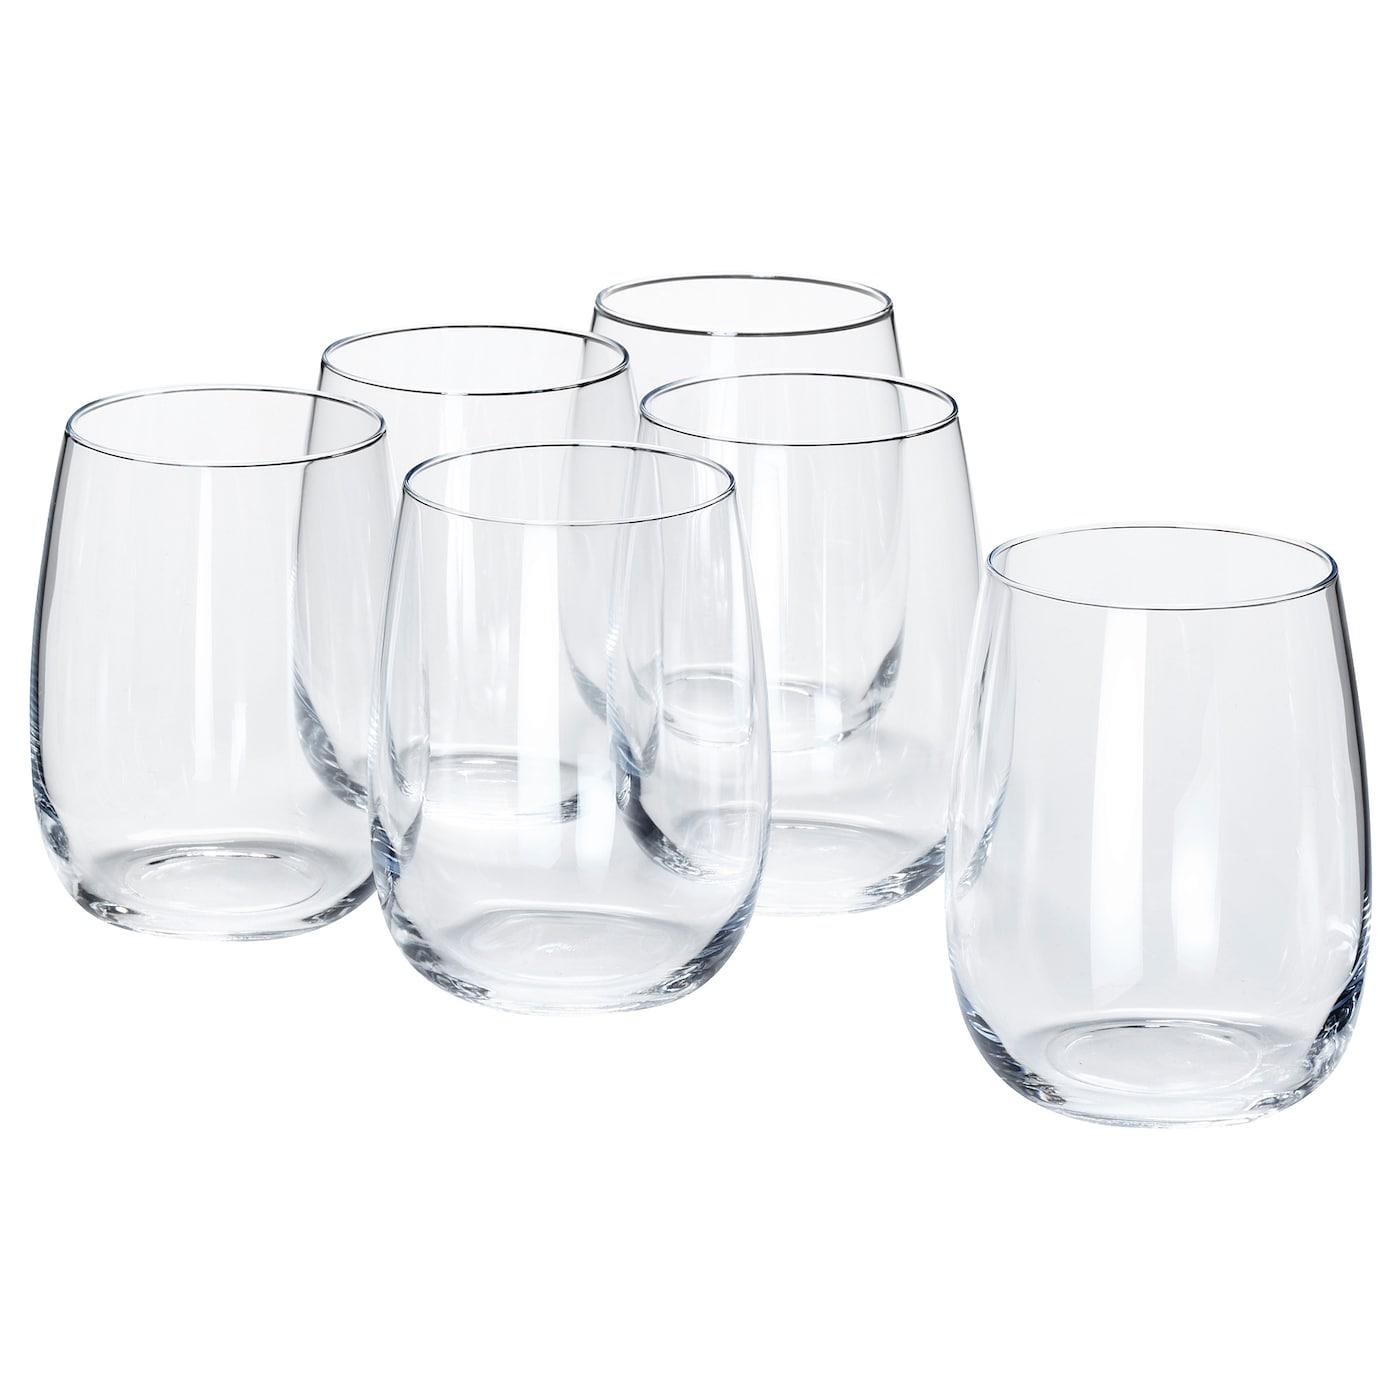 Storsint Glass Clear Glass Ikea